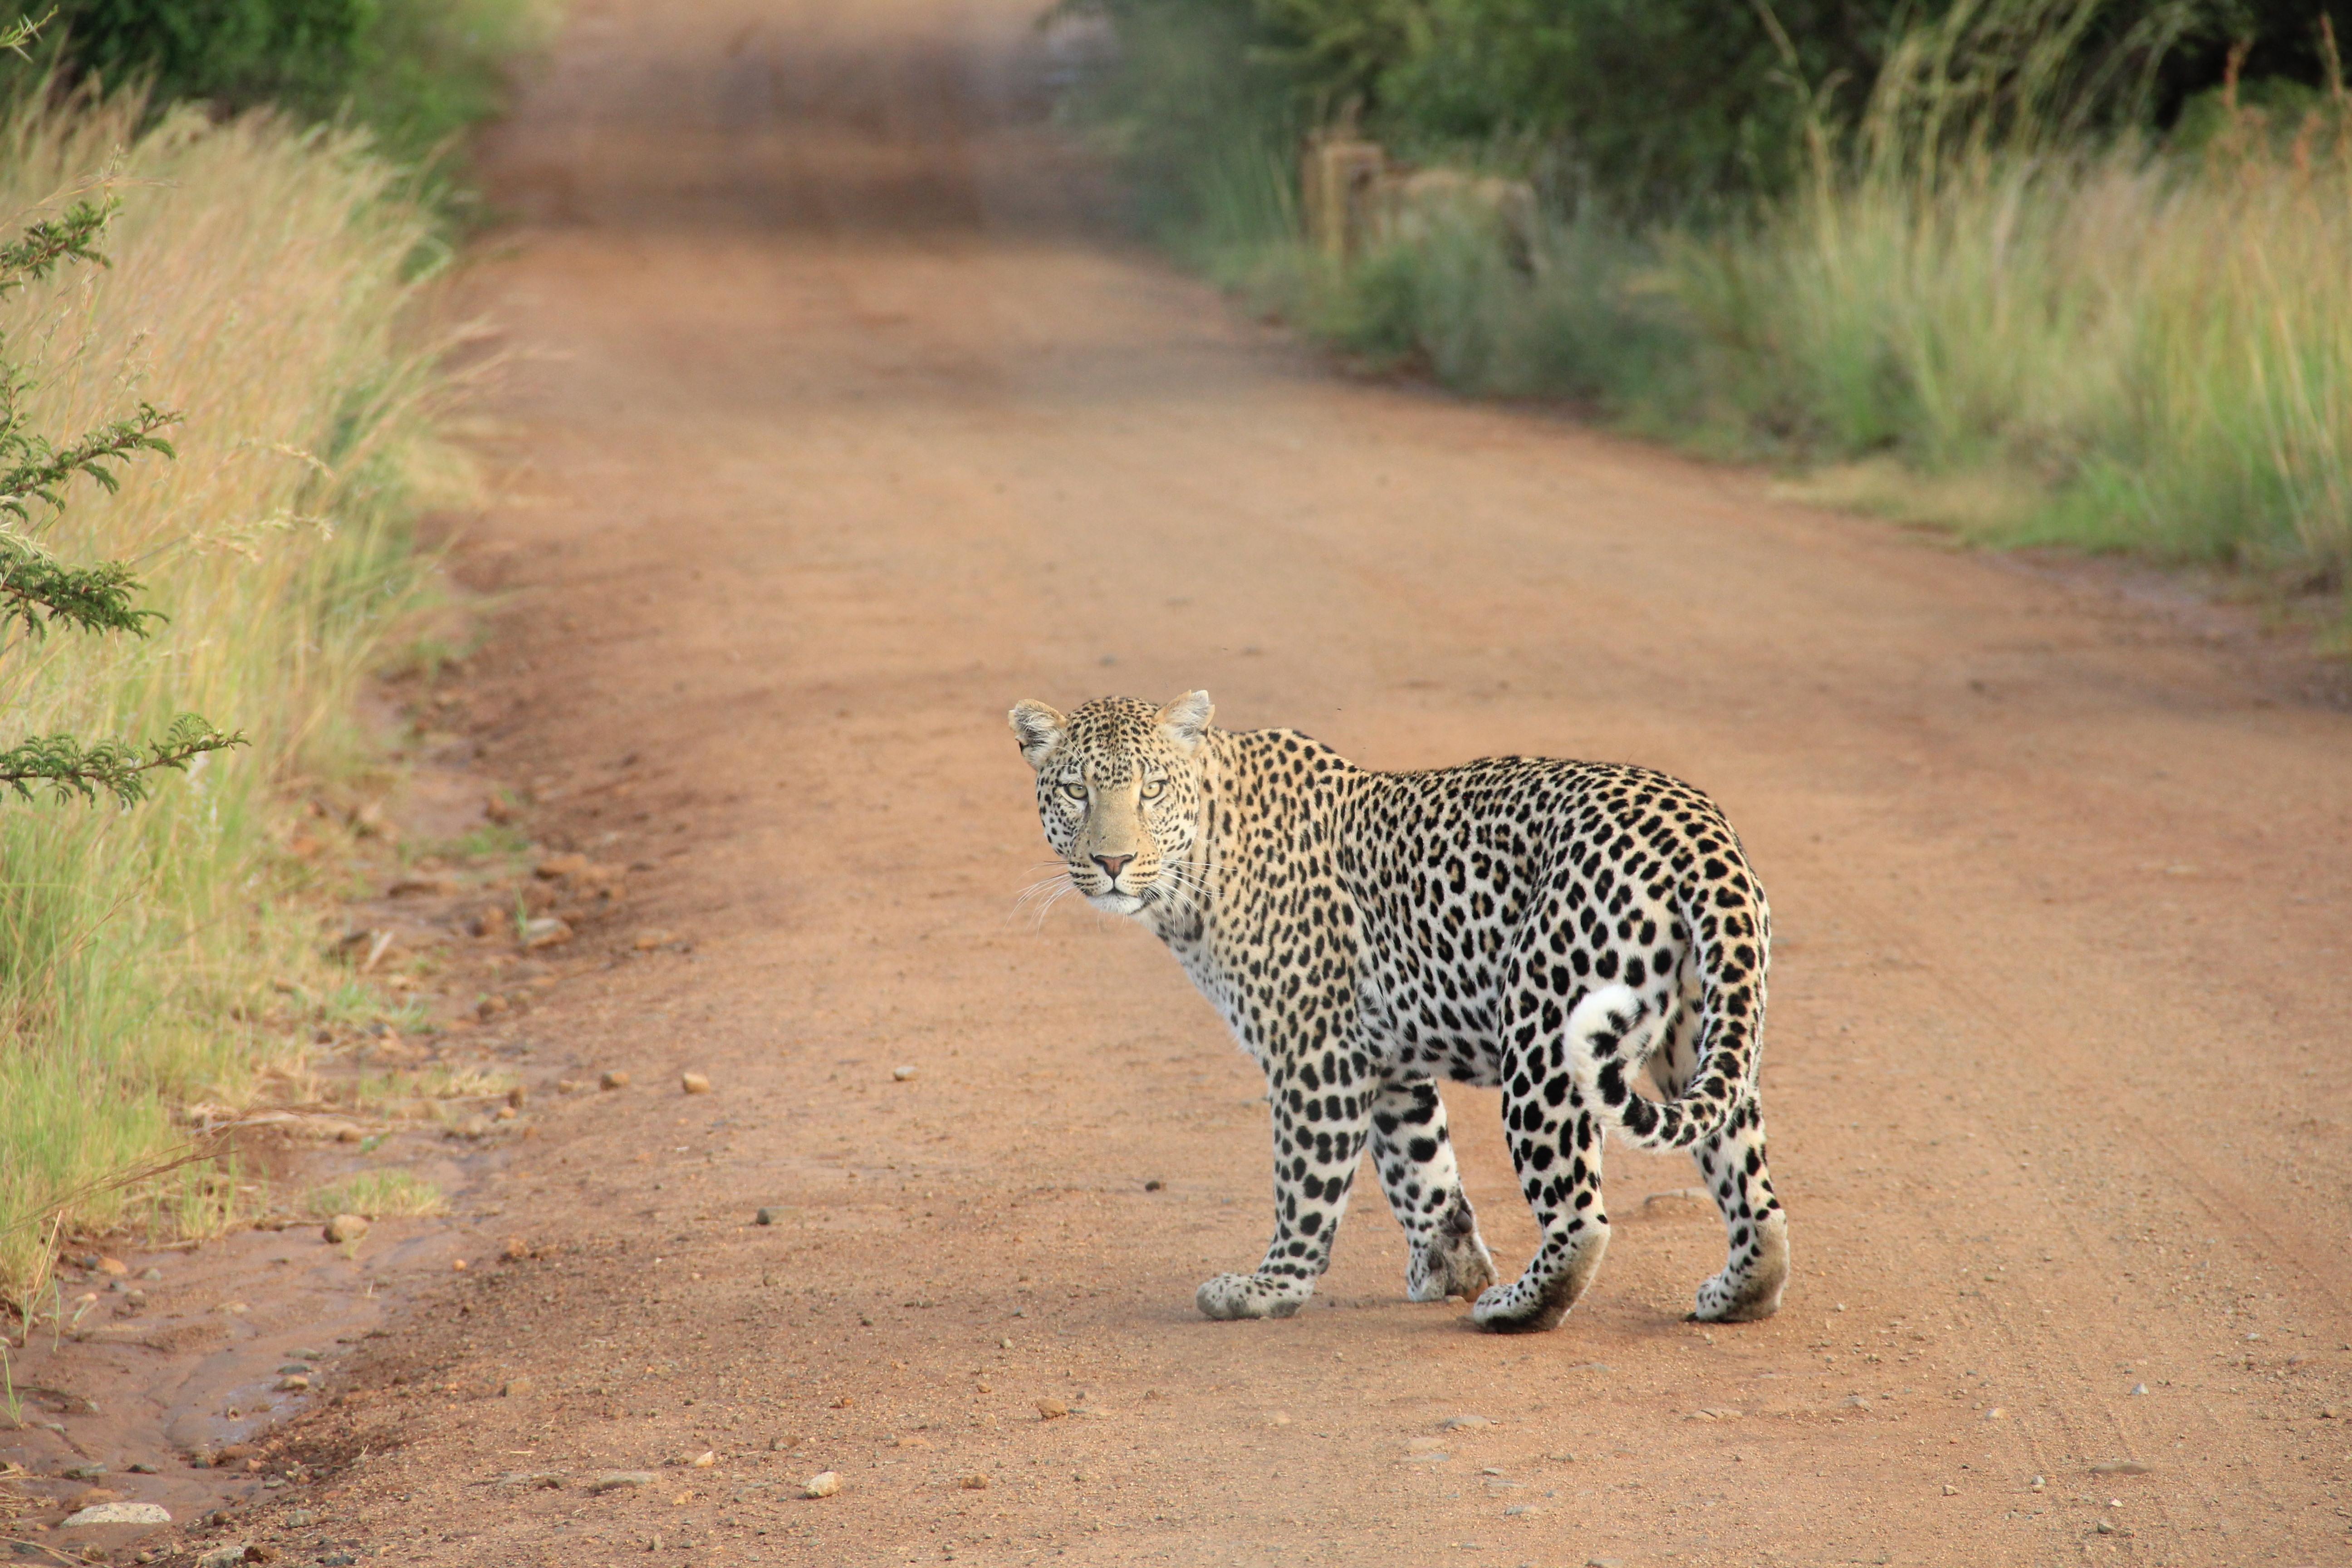 Africa Animal Cat Dangerous Leopard Nature